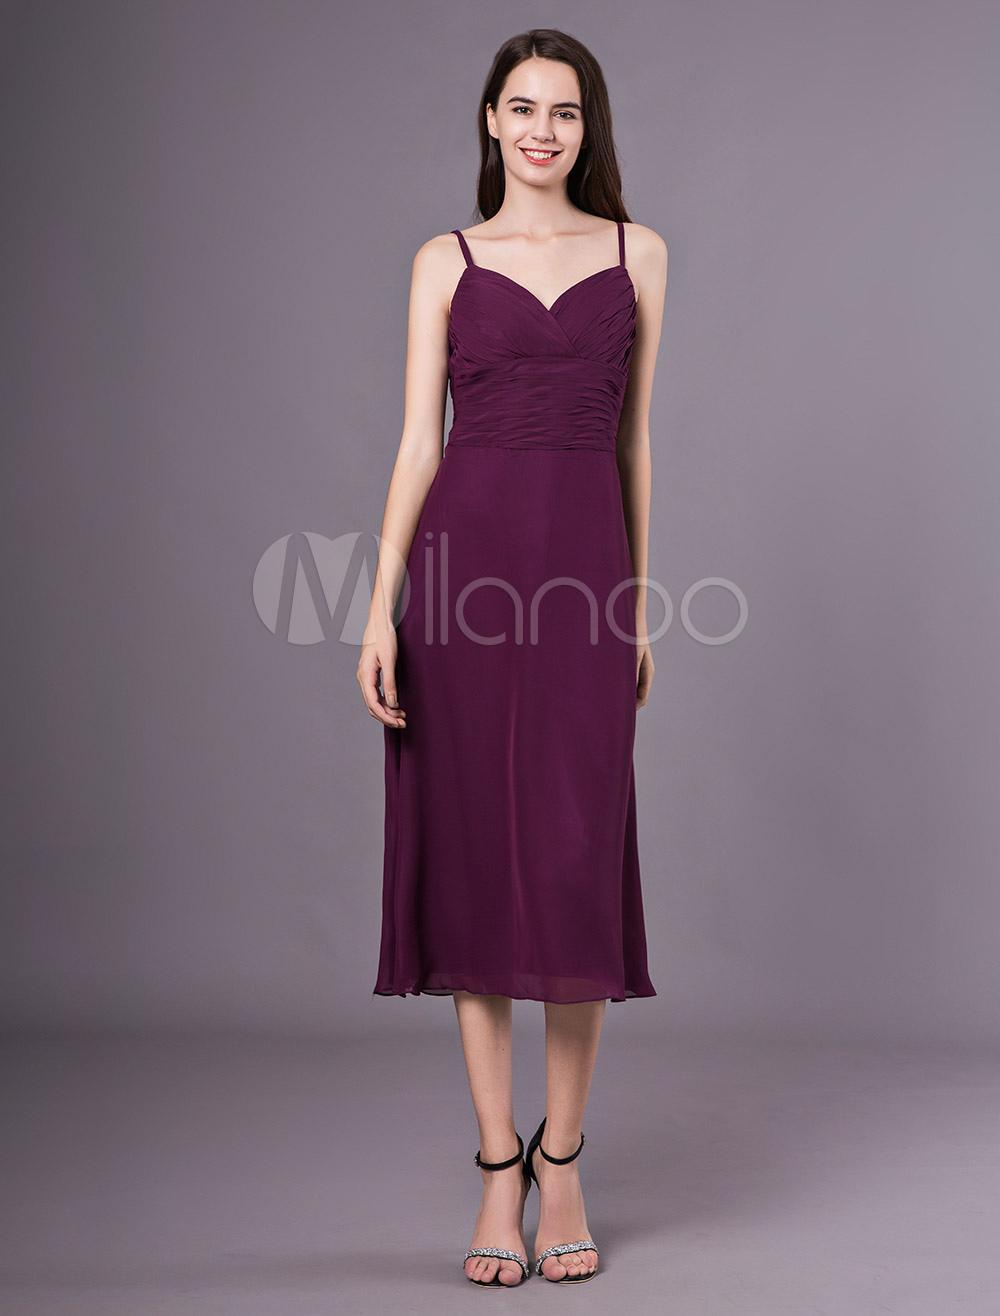 acfaf0805 ... Ameixa vestidos de dama de honra curto Chiffon Correias Tea Length  Wedding Party Dress-No ...